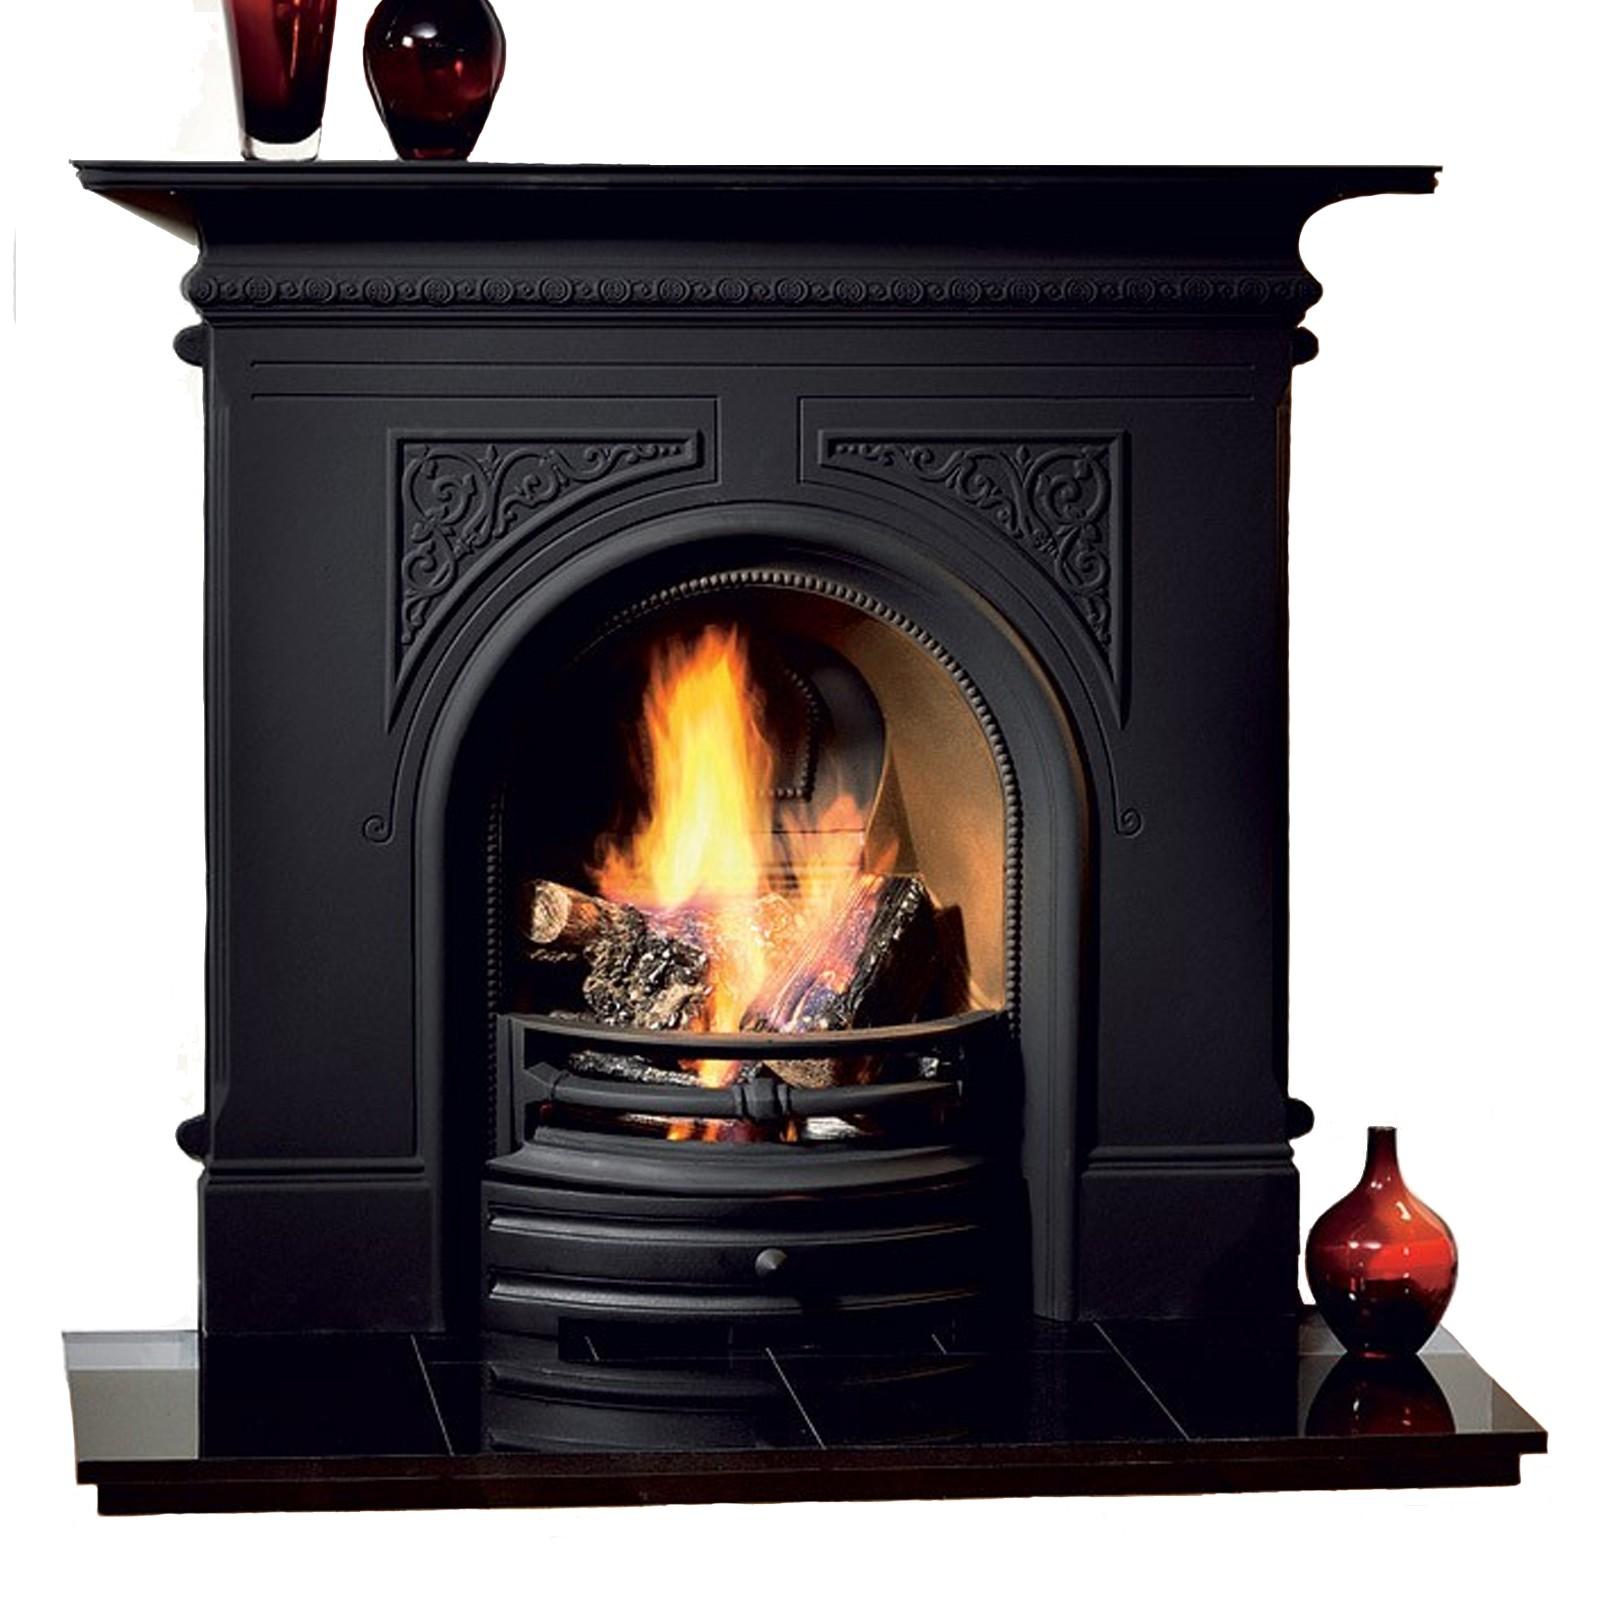 gallery pembroke cast iron fireplace victorian style